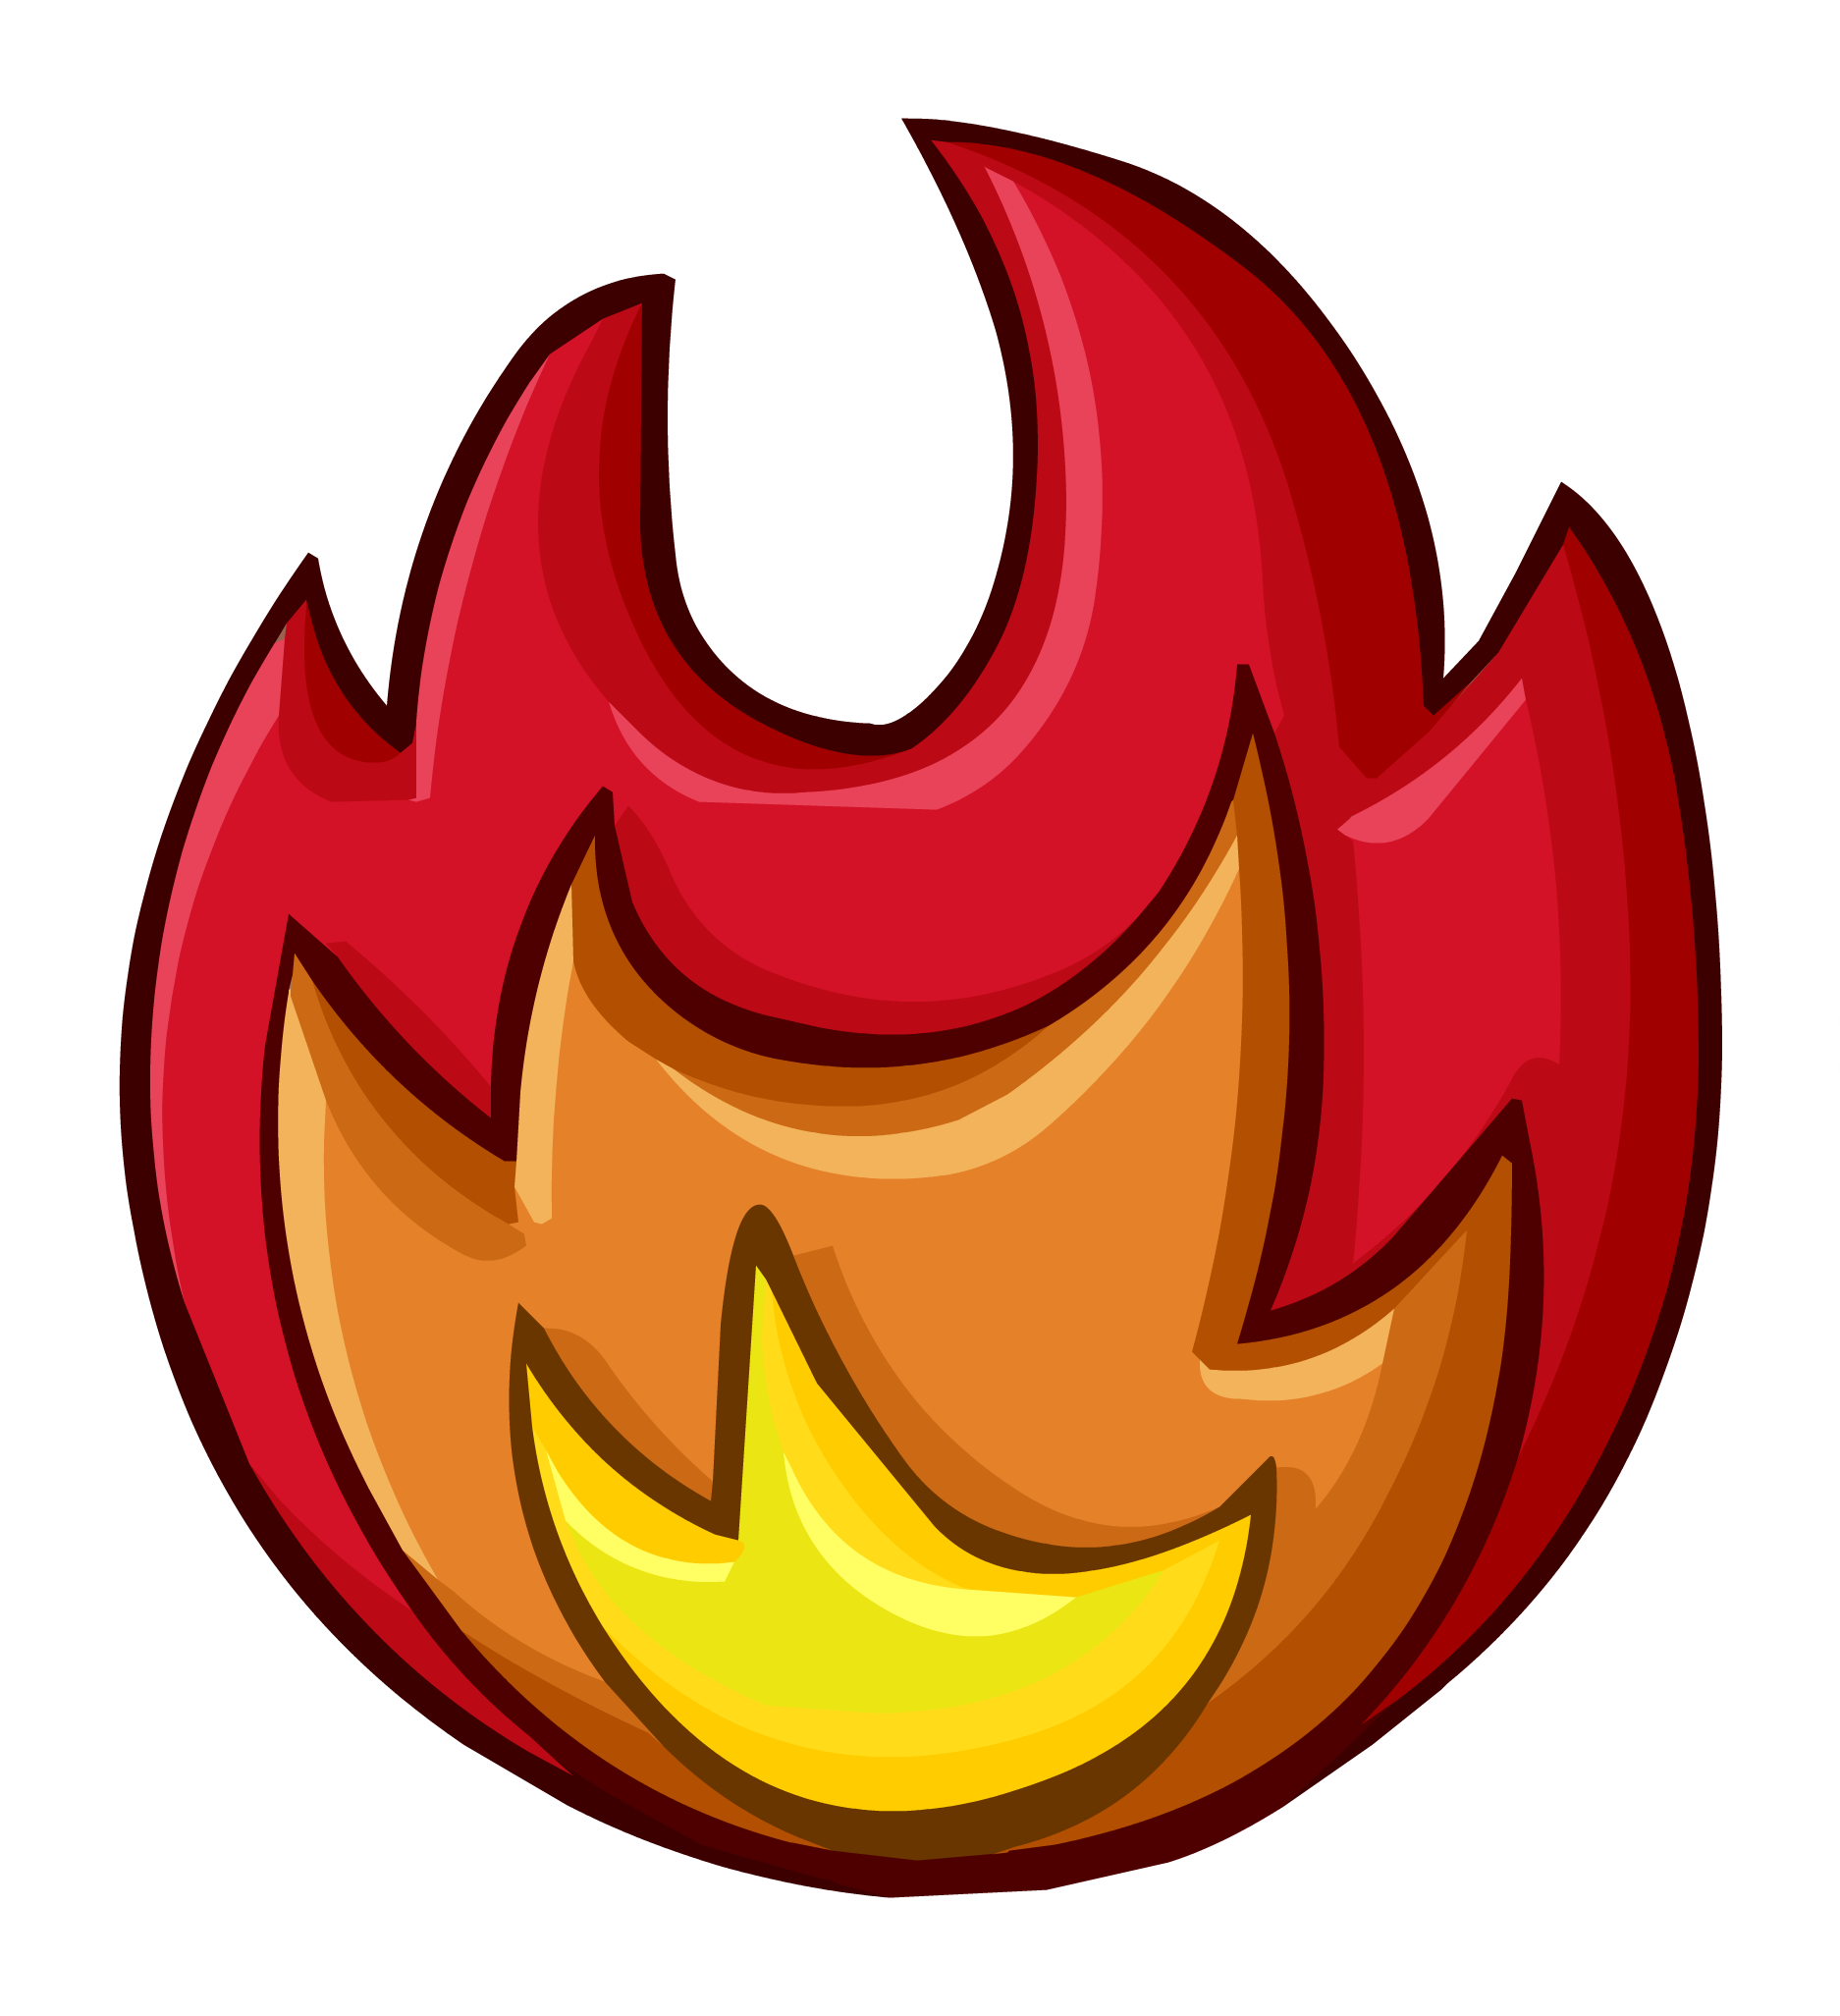 Elements club penguin wiki. Clipart fire fire element